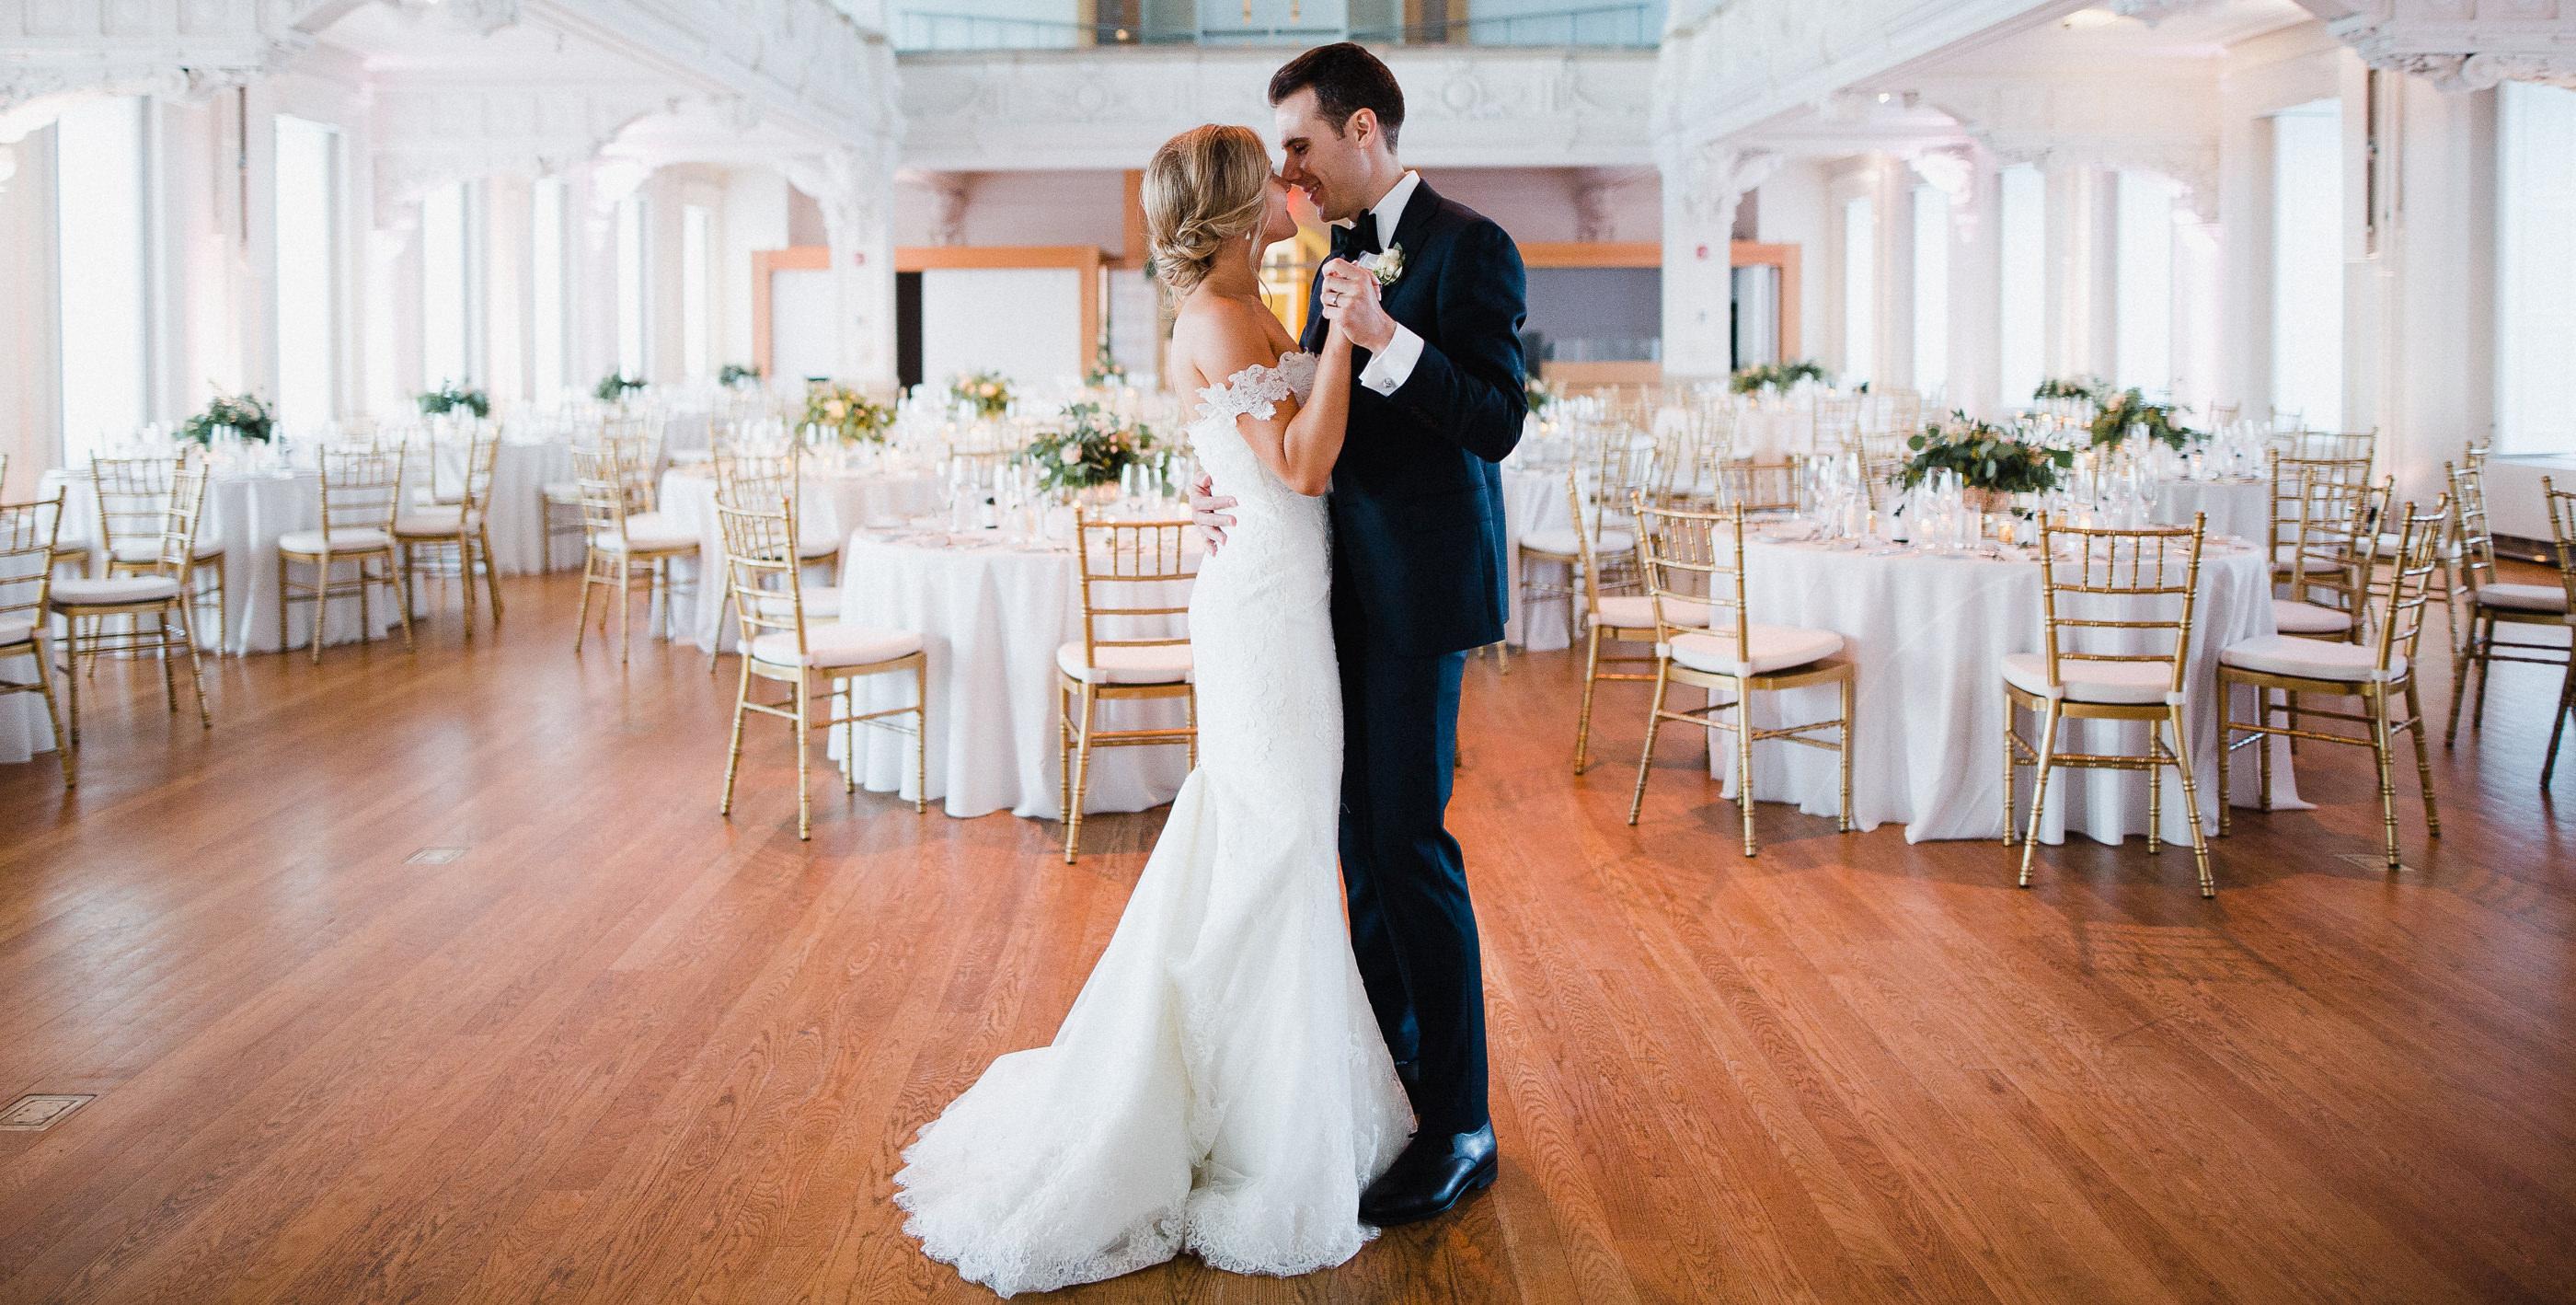 portfolio-photographies-de-mariage-sonia-bourdon-030